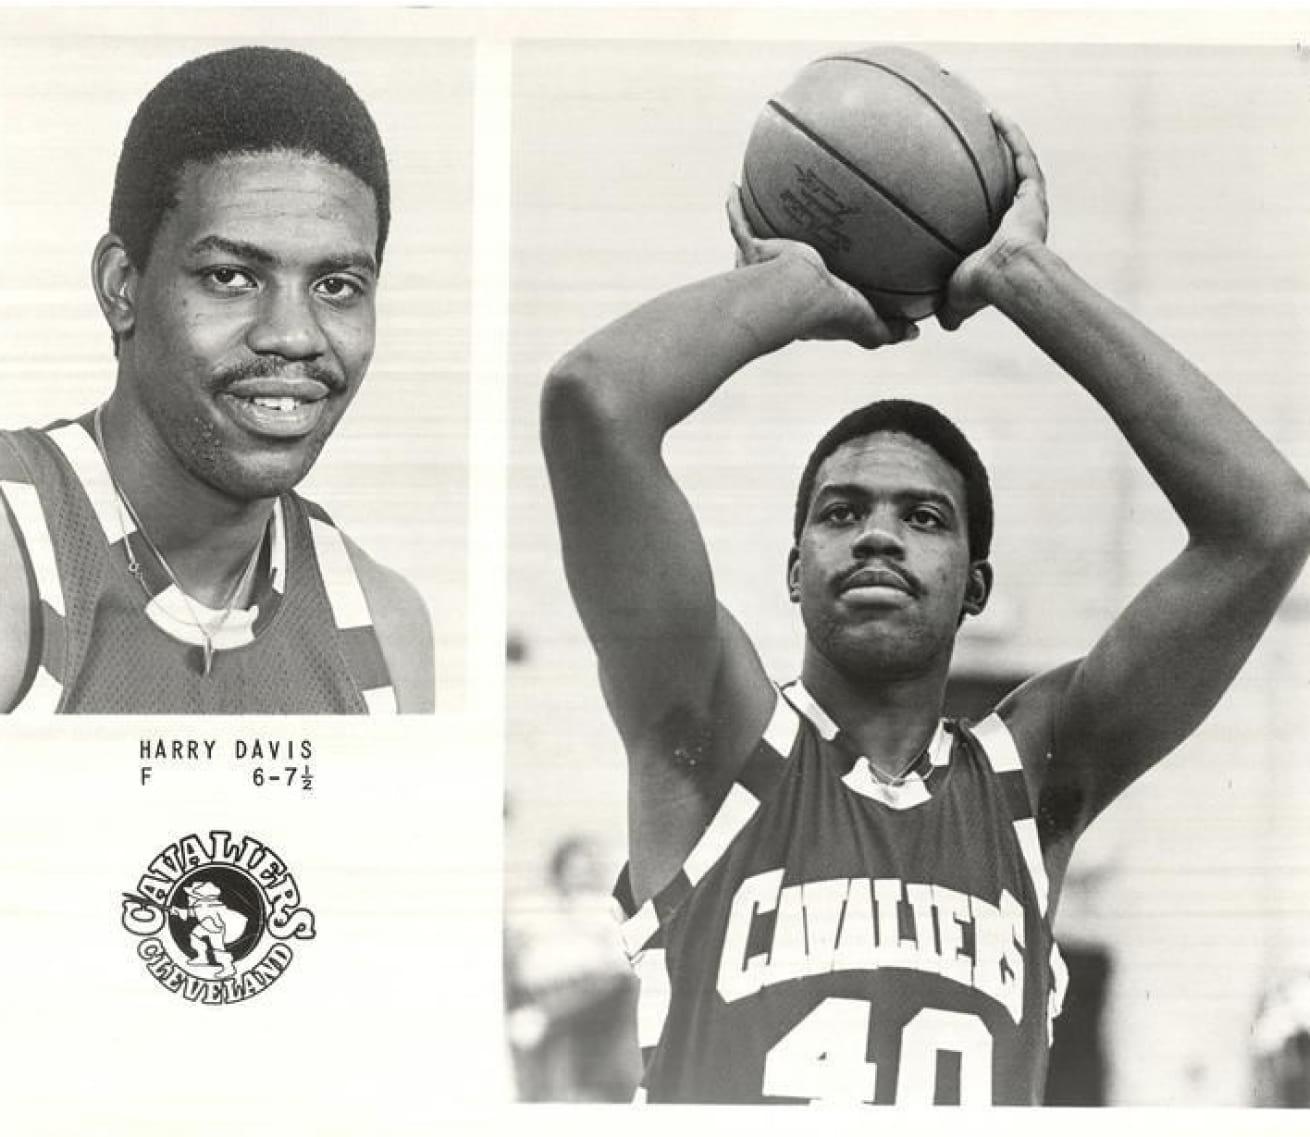 Harry Davis basketball portraits